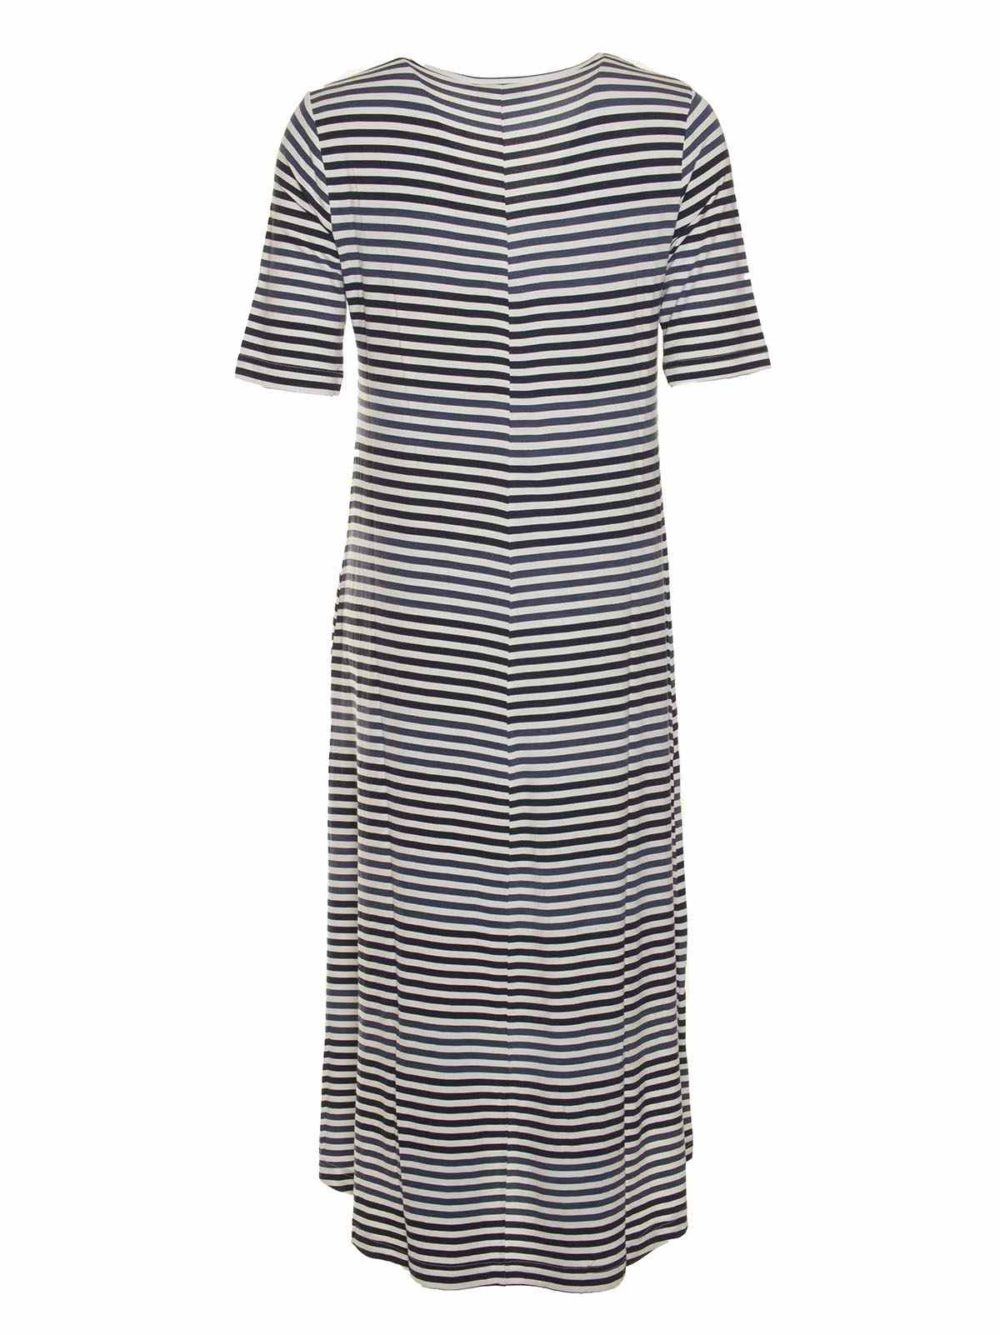 Dress PSA 9025B Capri Katie Kerr Women's Clothing